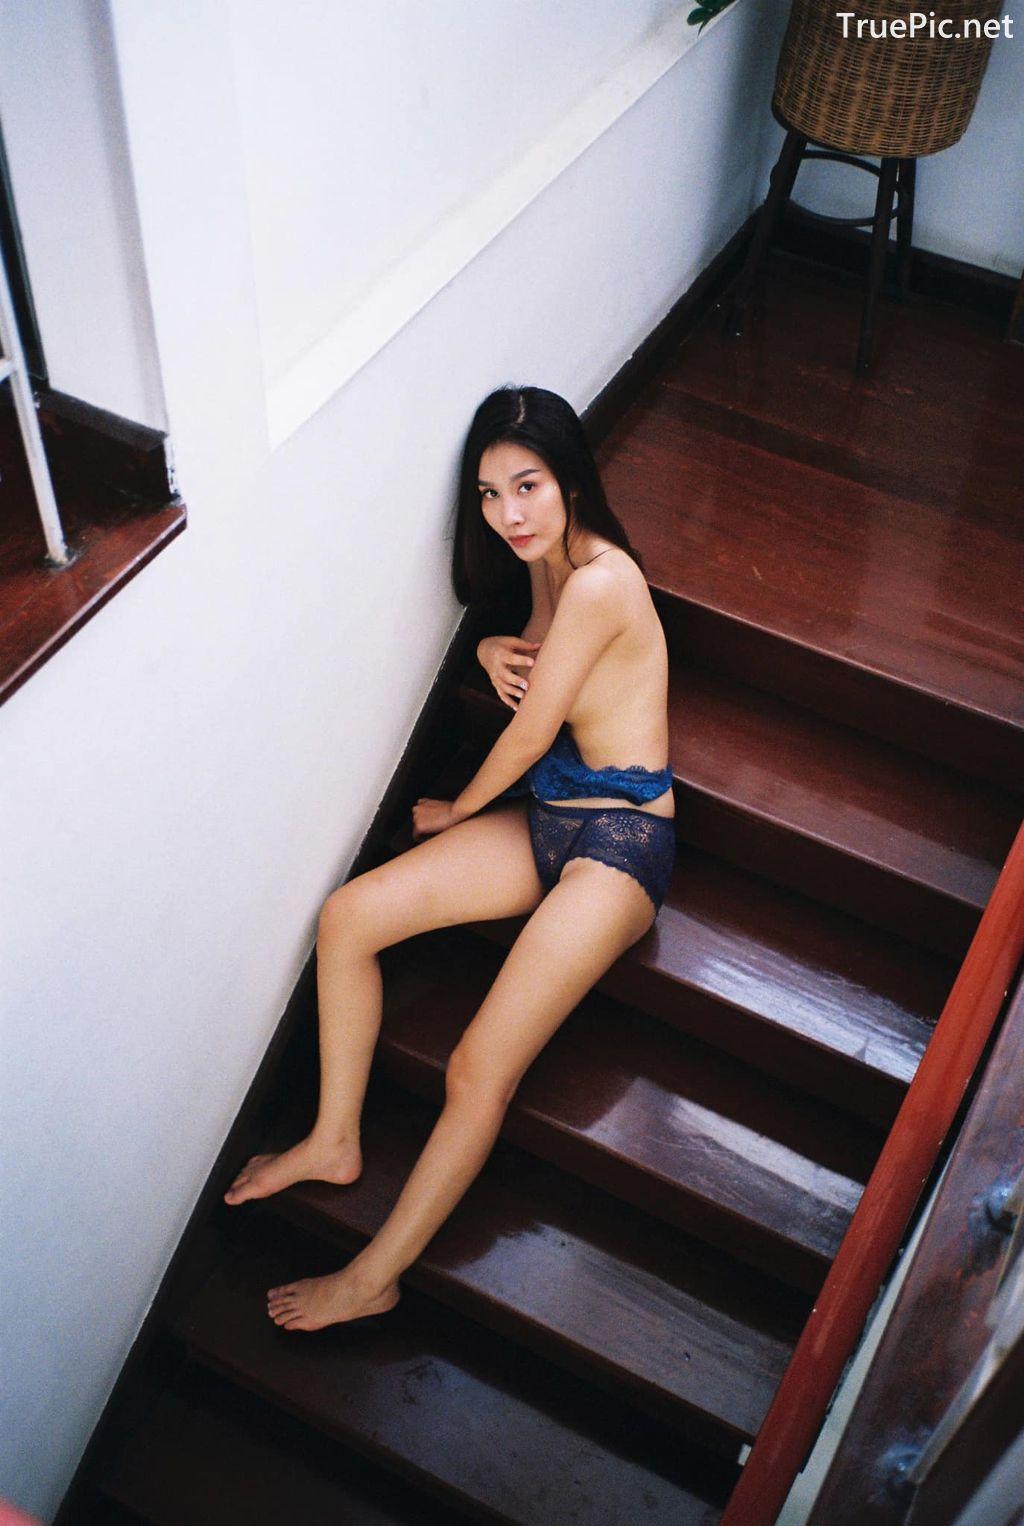 Image-Thailand-Model-Ssomch-Tanass-Blue-Lingerie-TruePic.net-TruePic.net- Picture-25